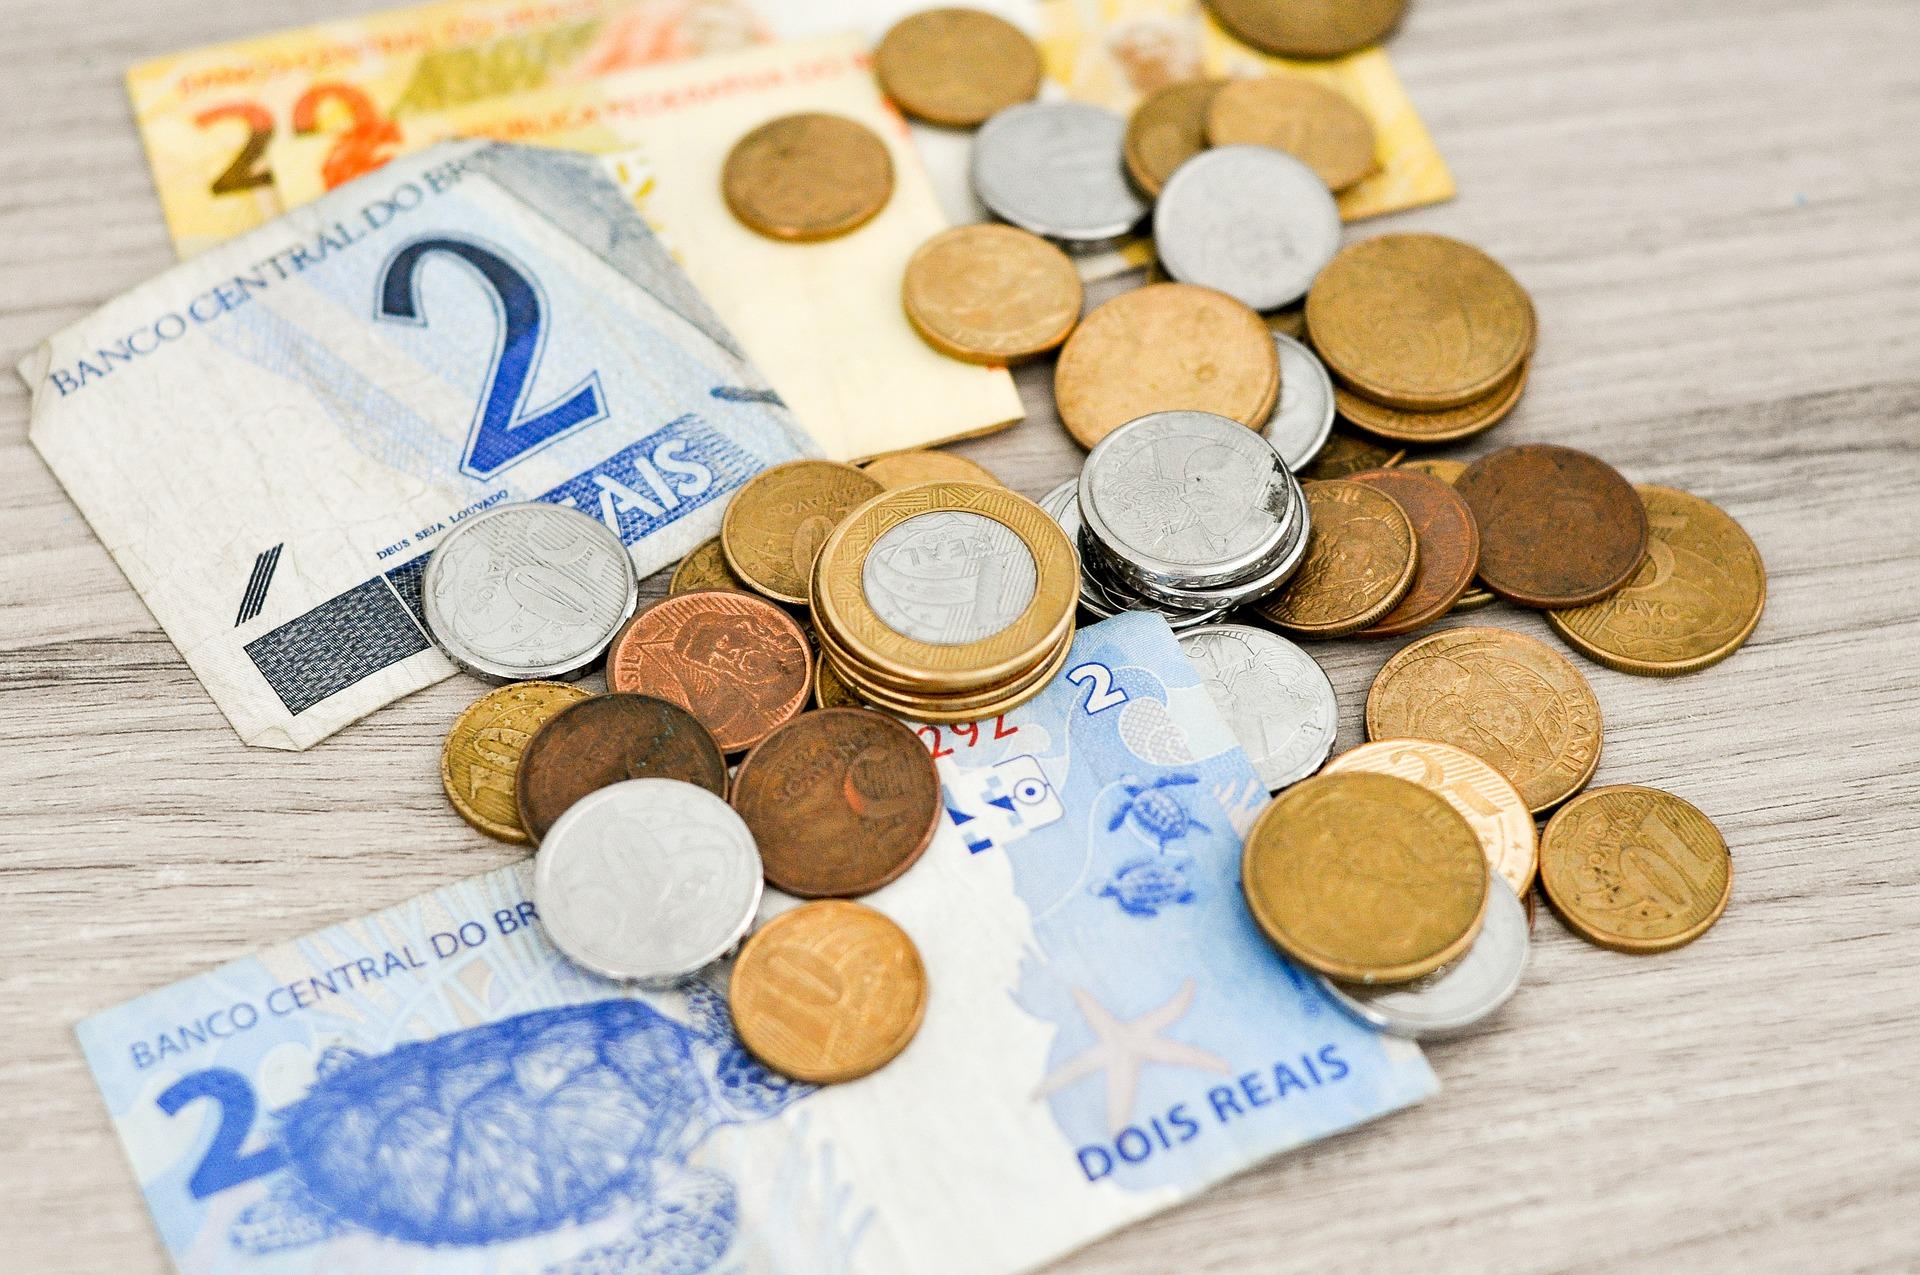 Com novos títulos no Tesouro Direto, confiras as taxas de rentabilidade desta segunda